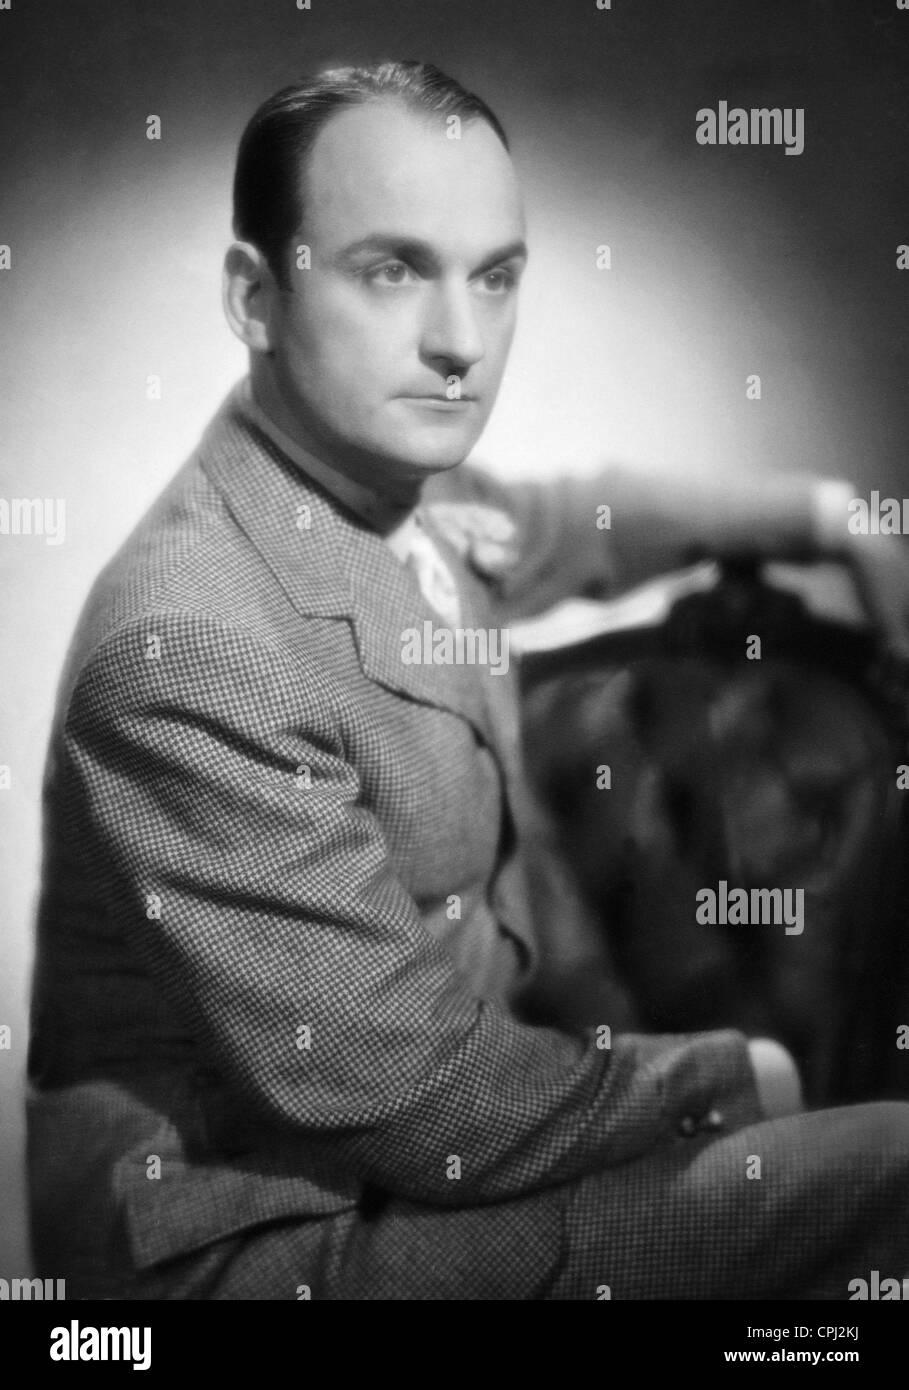 Willi Forst dans 'Bel Ami', 1939 Photo Stock